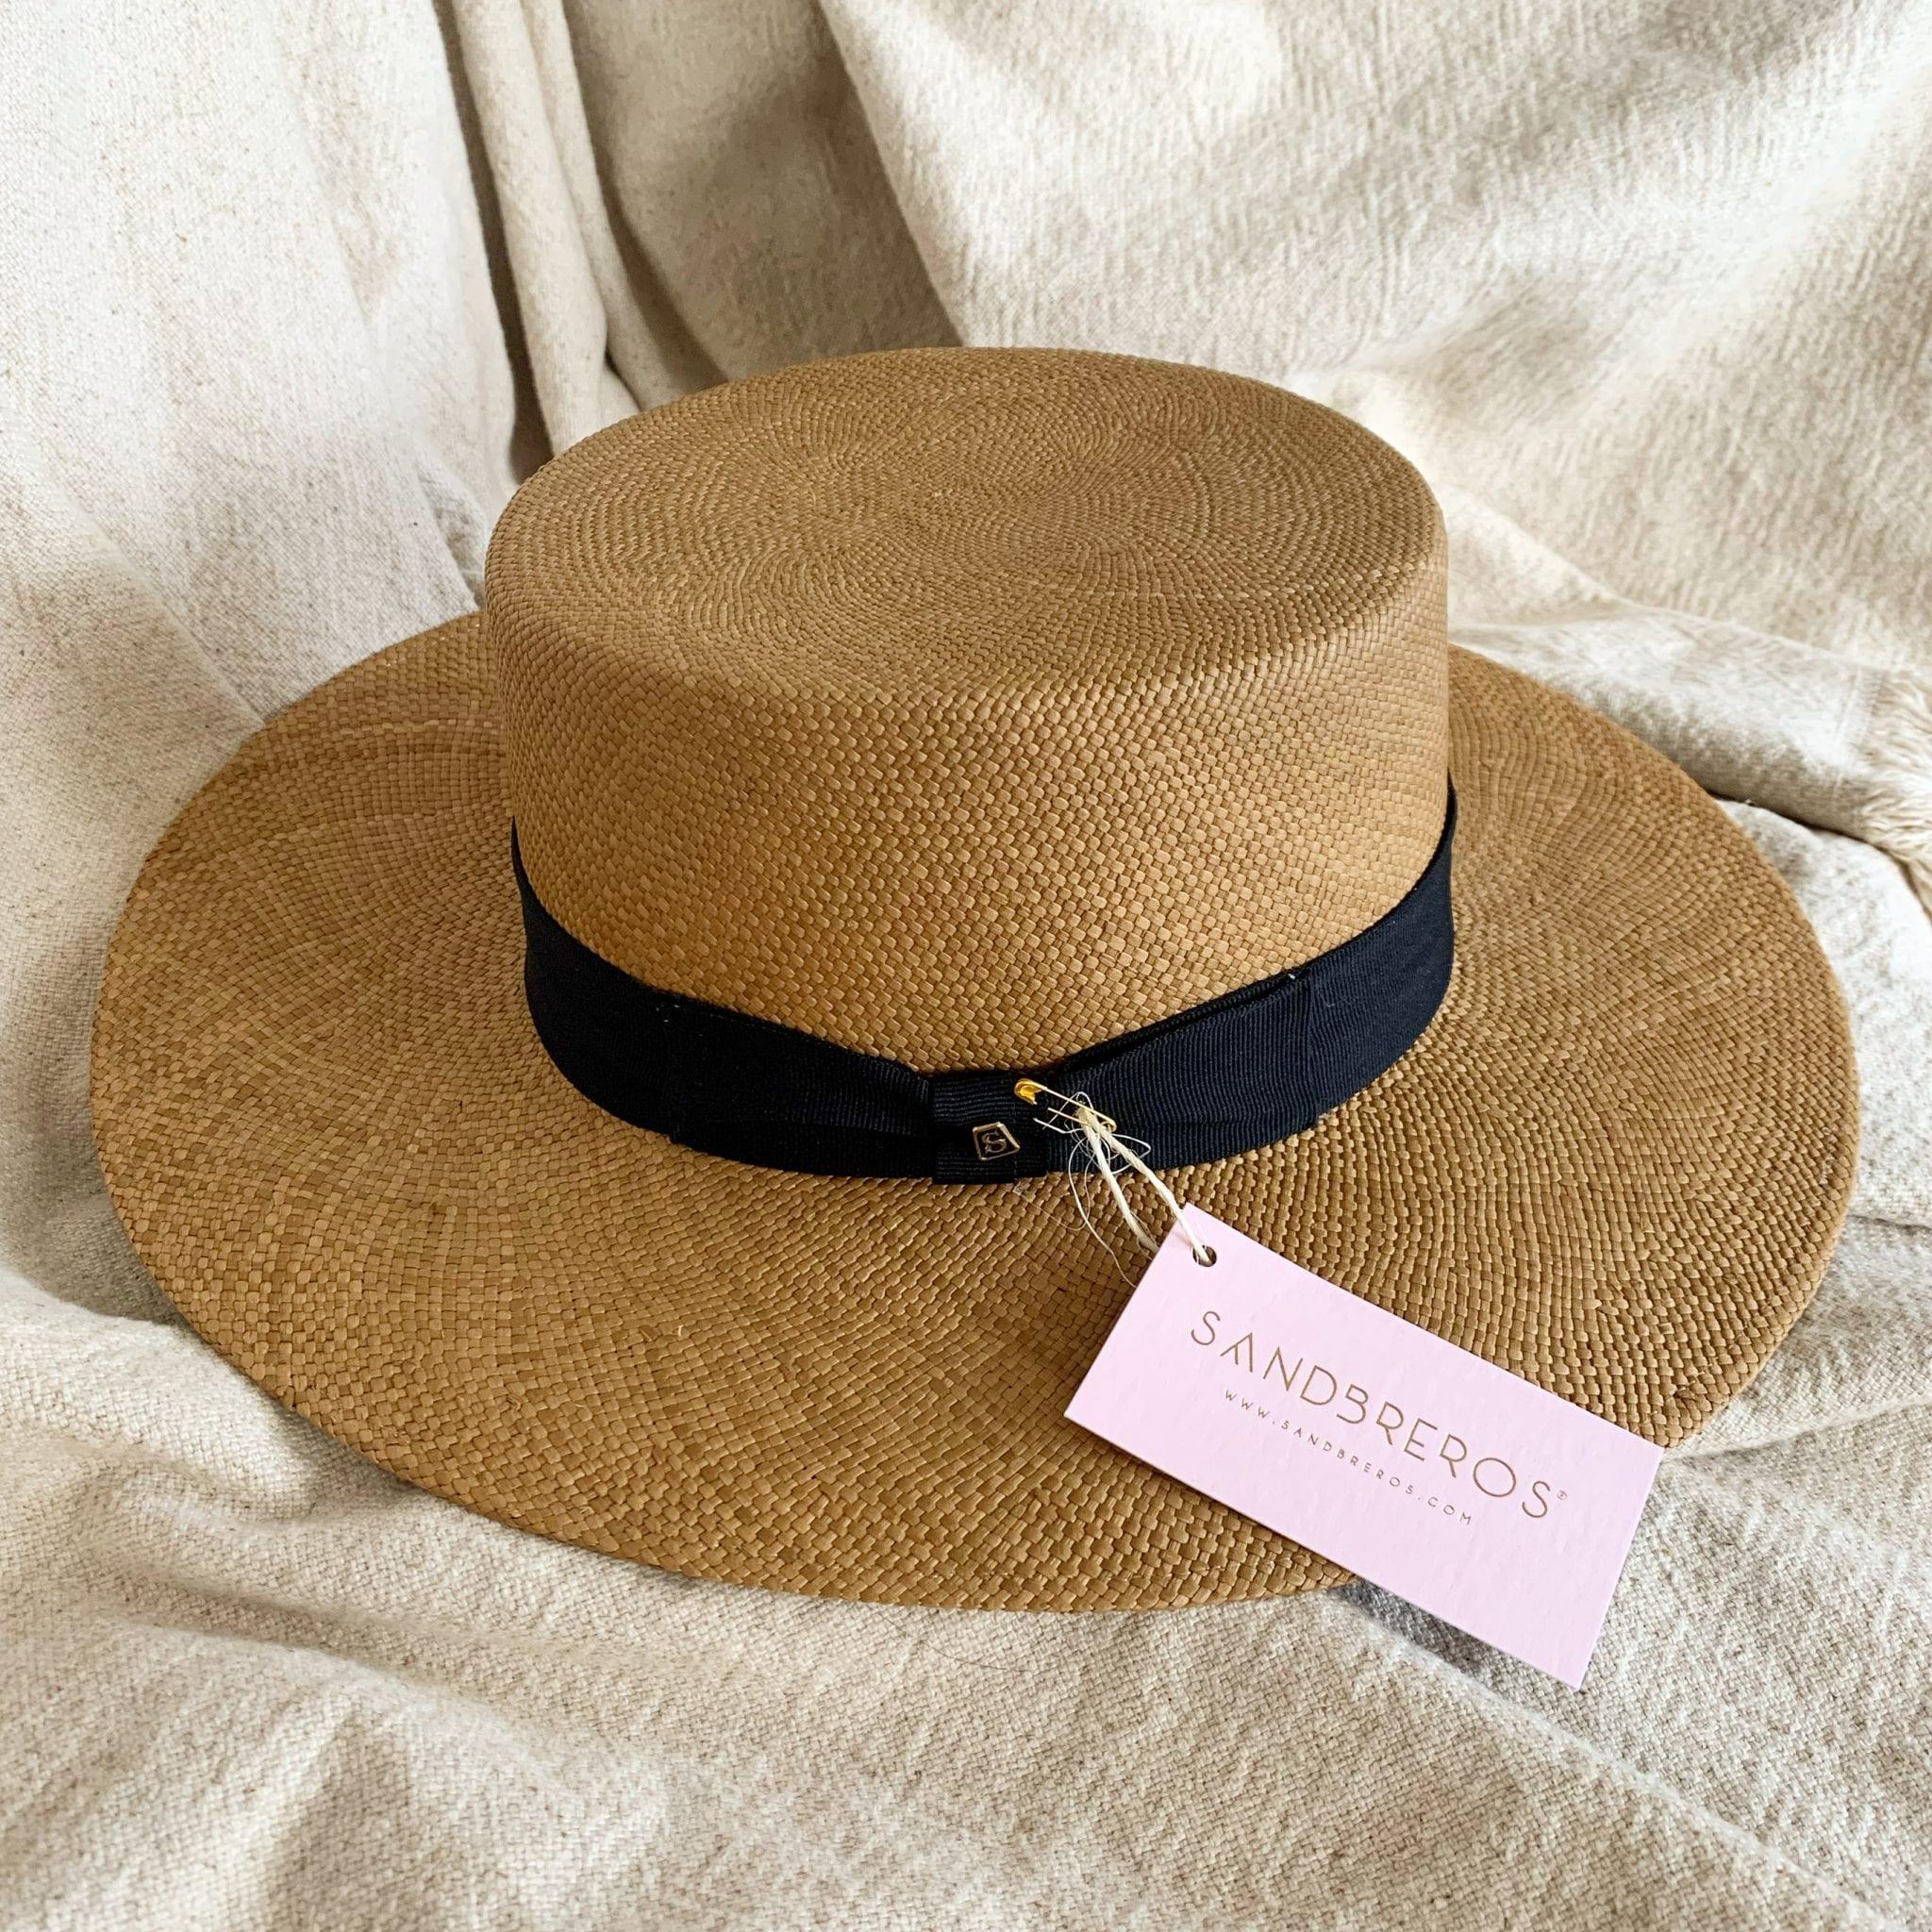 cordobes moca cafe capuccino sandbreros hats